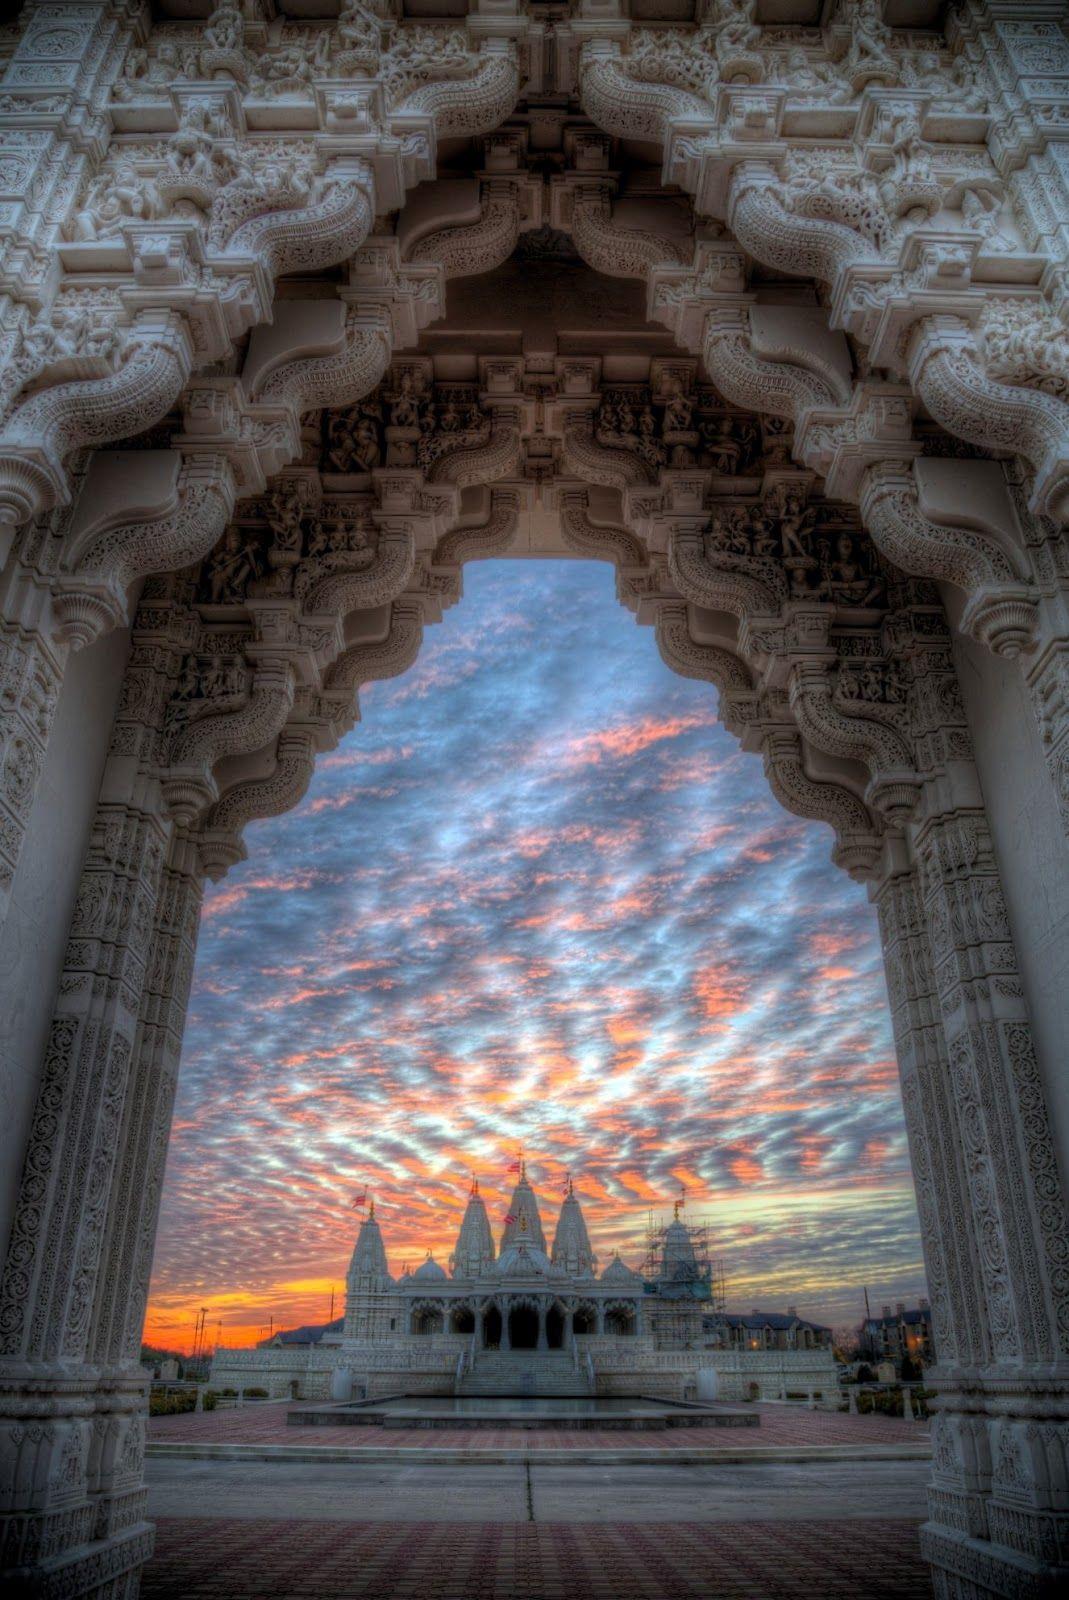 HDR photo of BAPS Shri Swaminarayan Mandir - Houston at sunset- in Stafford, Texas